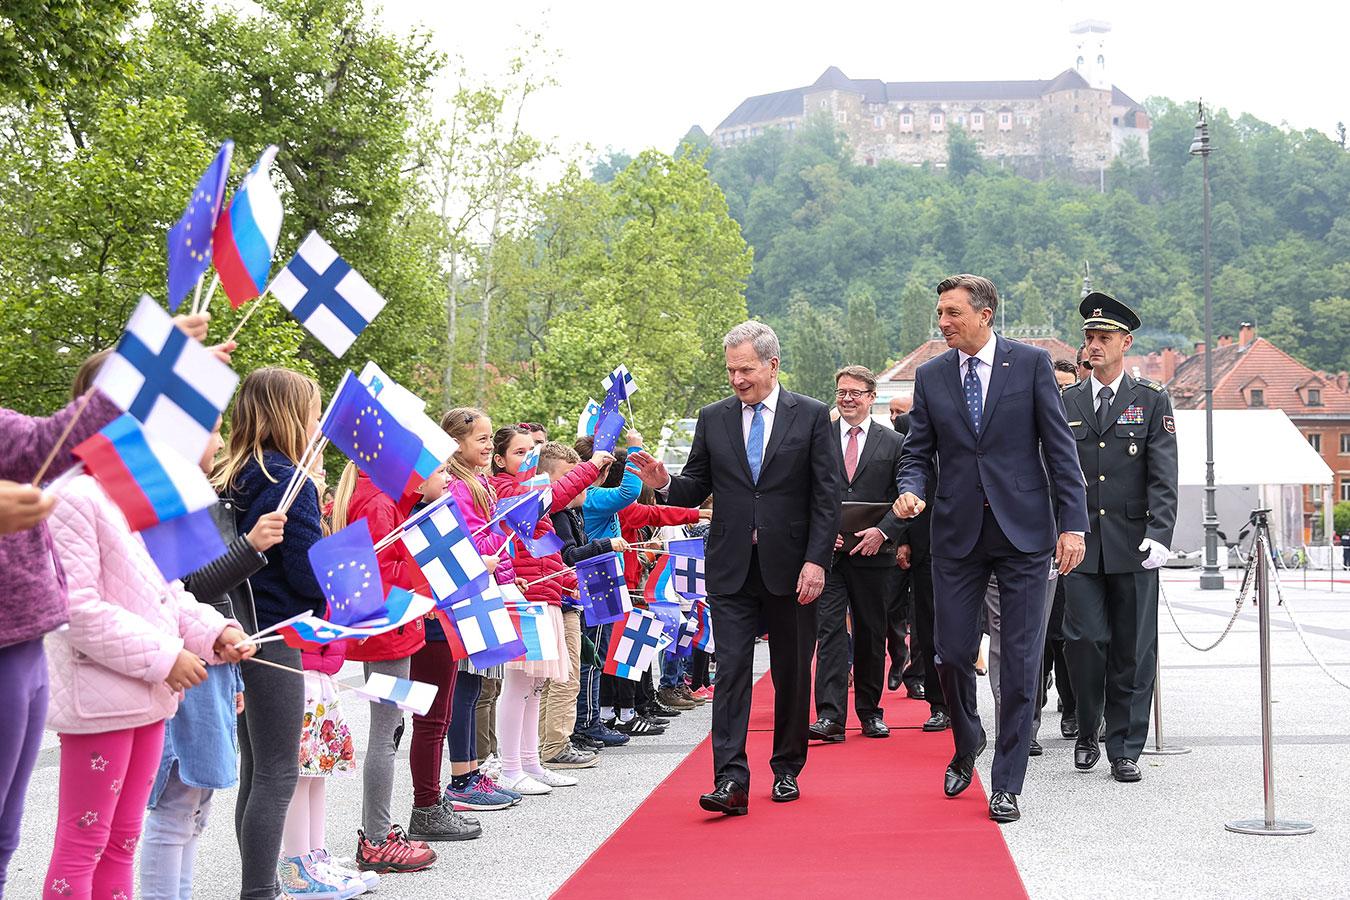 fin-markku-virri-finnish-president-slovenia.jpg